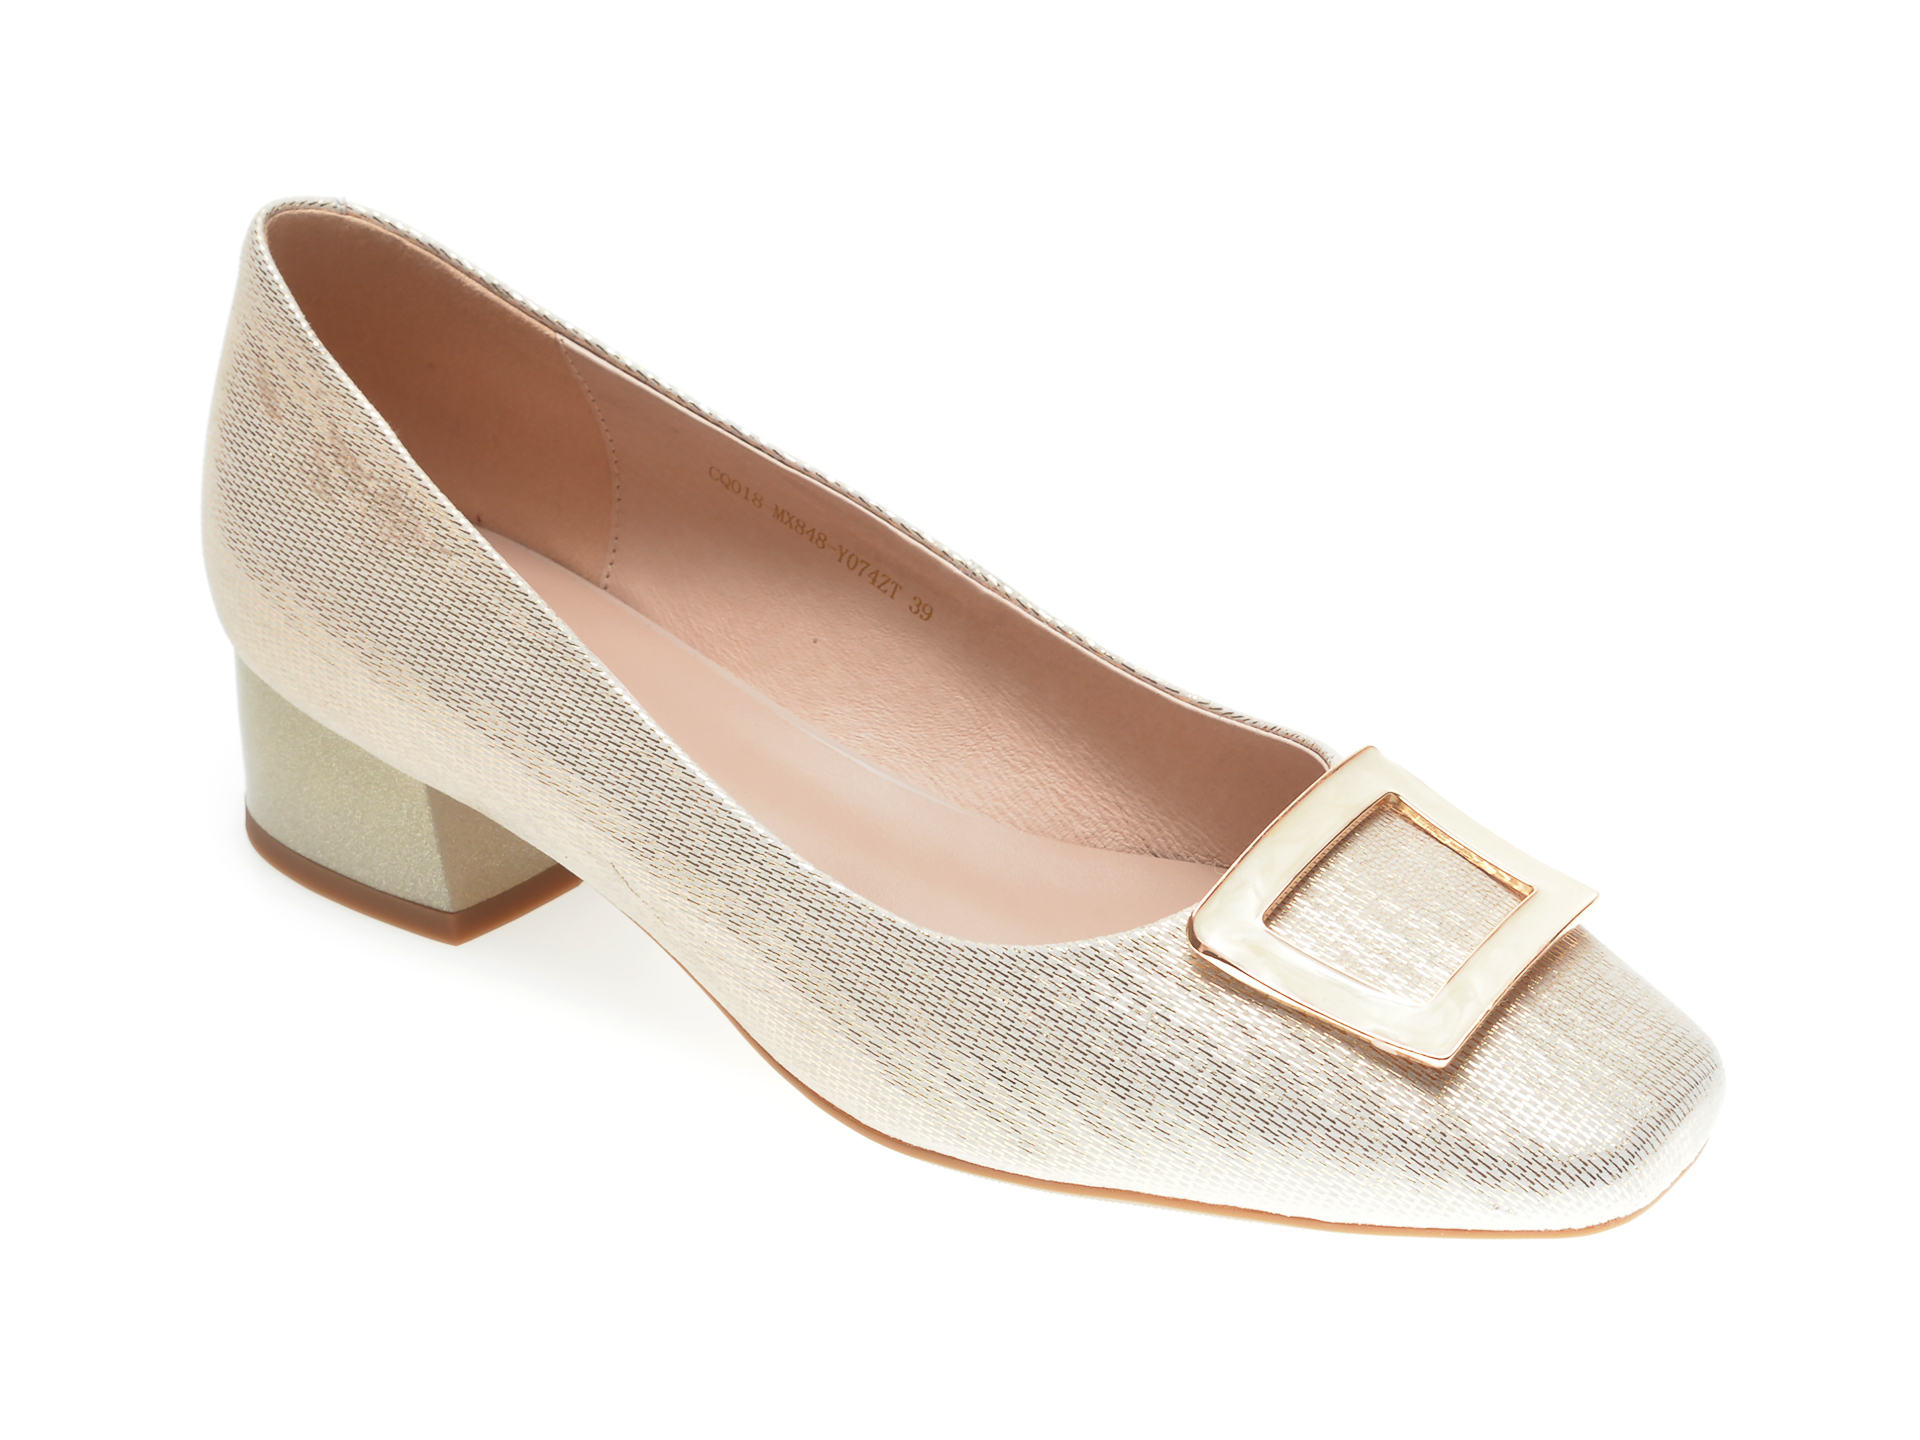 Pantofi EPICA aurii, MX848, din piele naturala